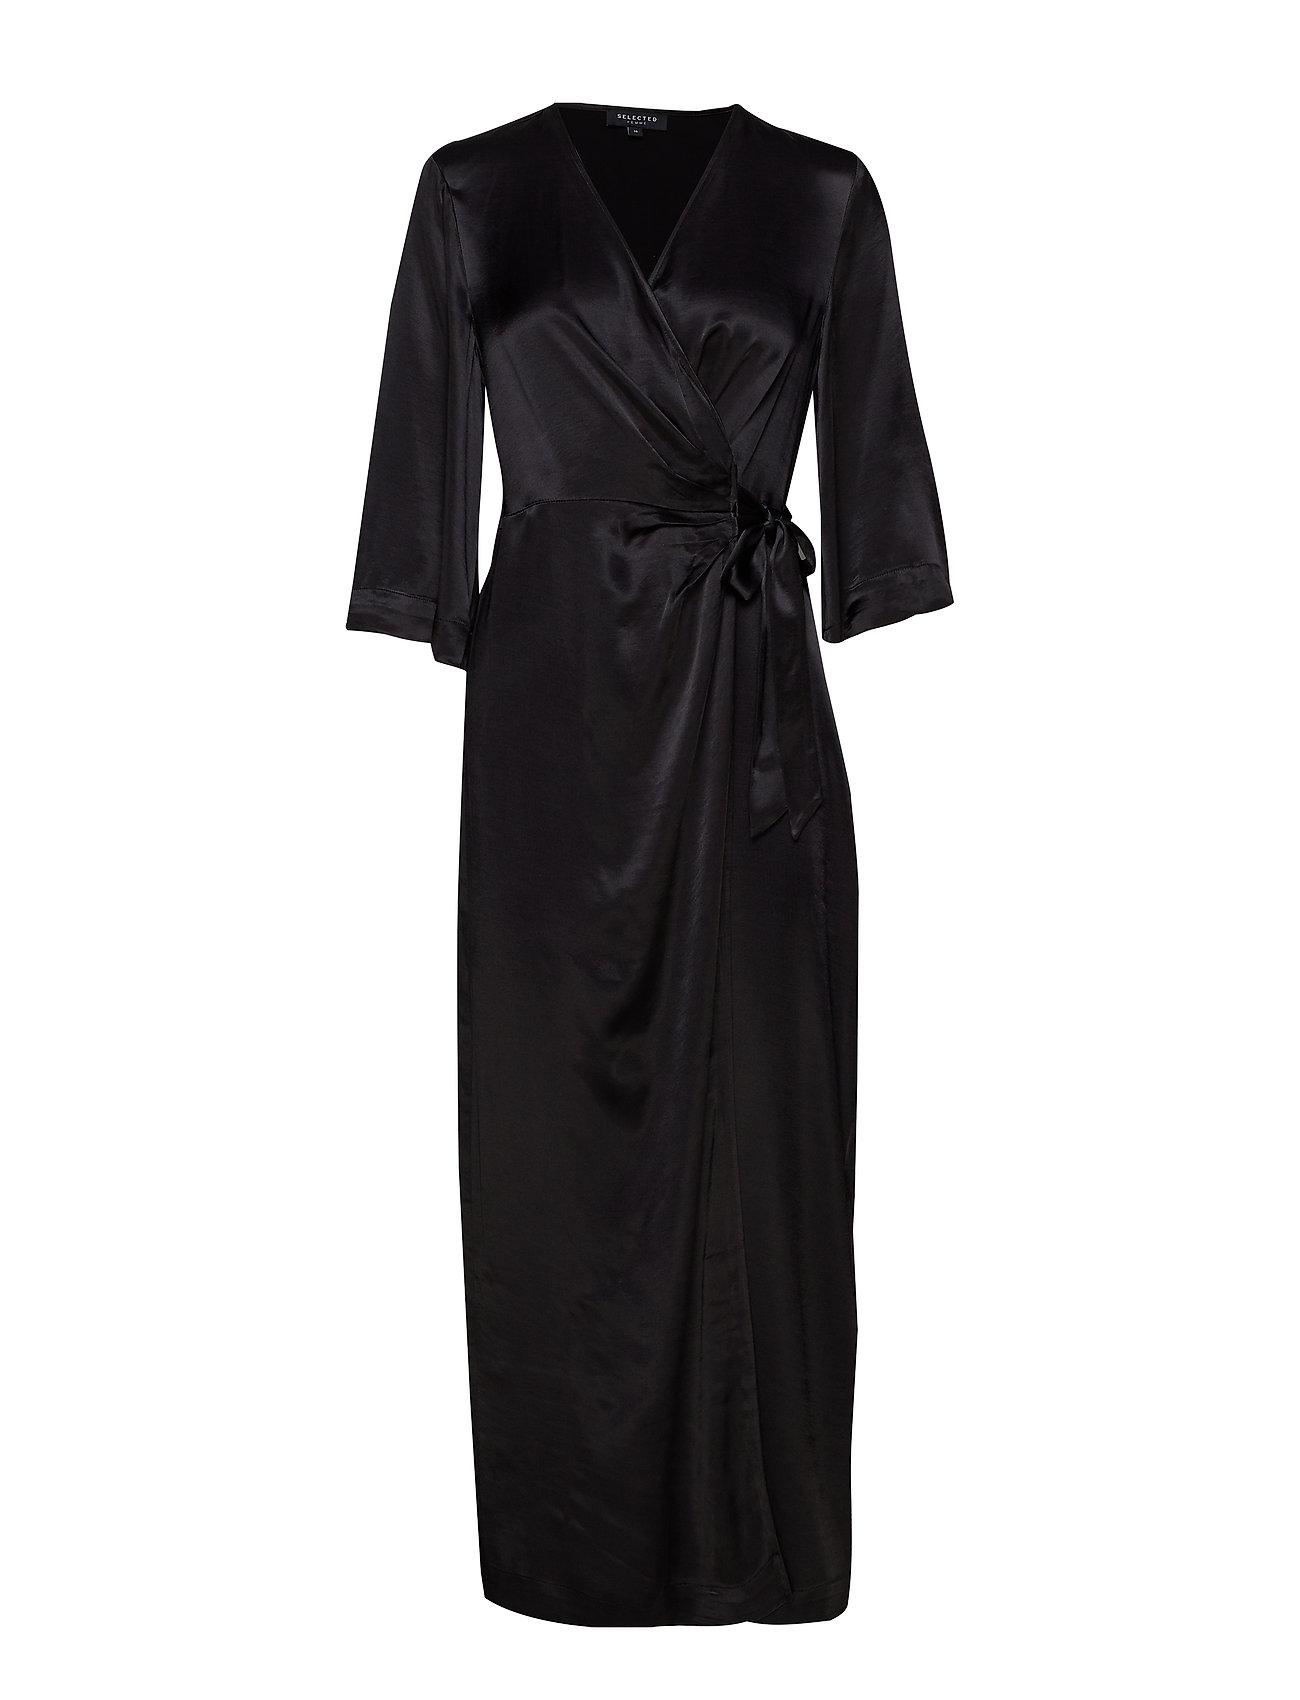 Selected Femme SLFDAKOTA 3/4 ANKLE WRAP DRESS CAMP - BLACK